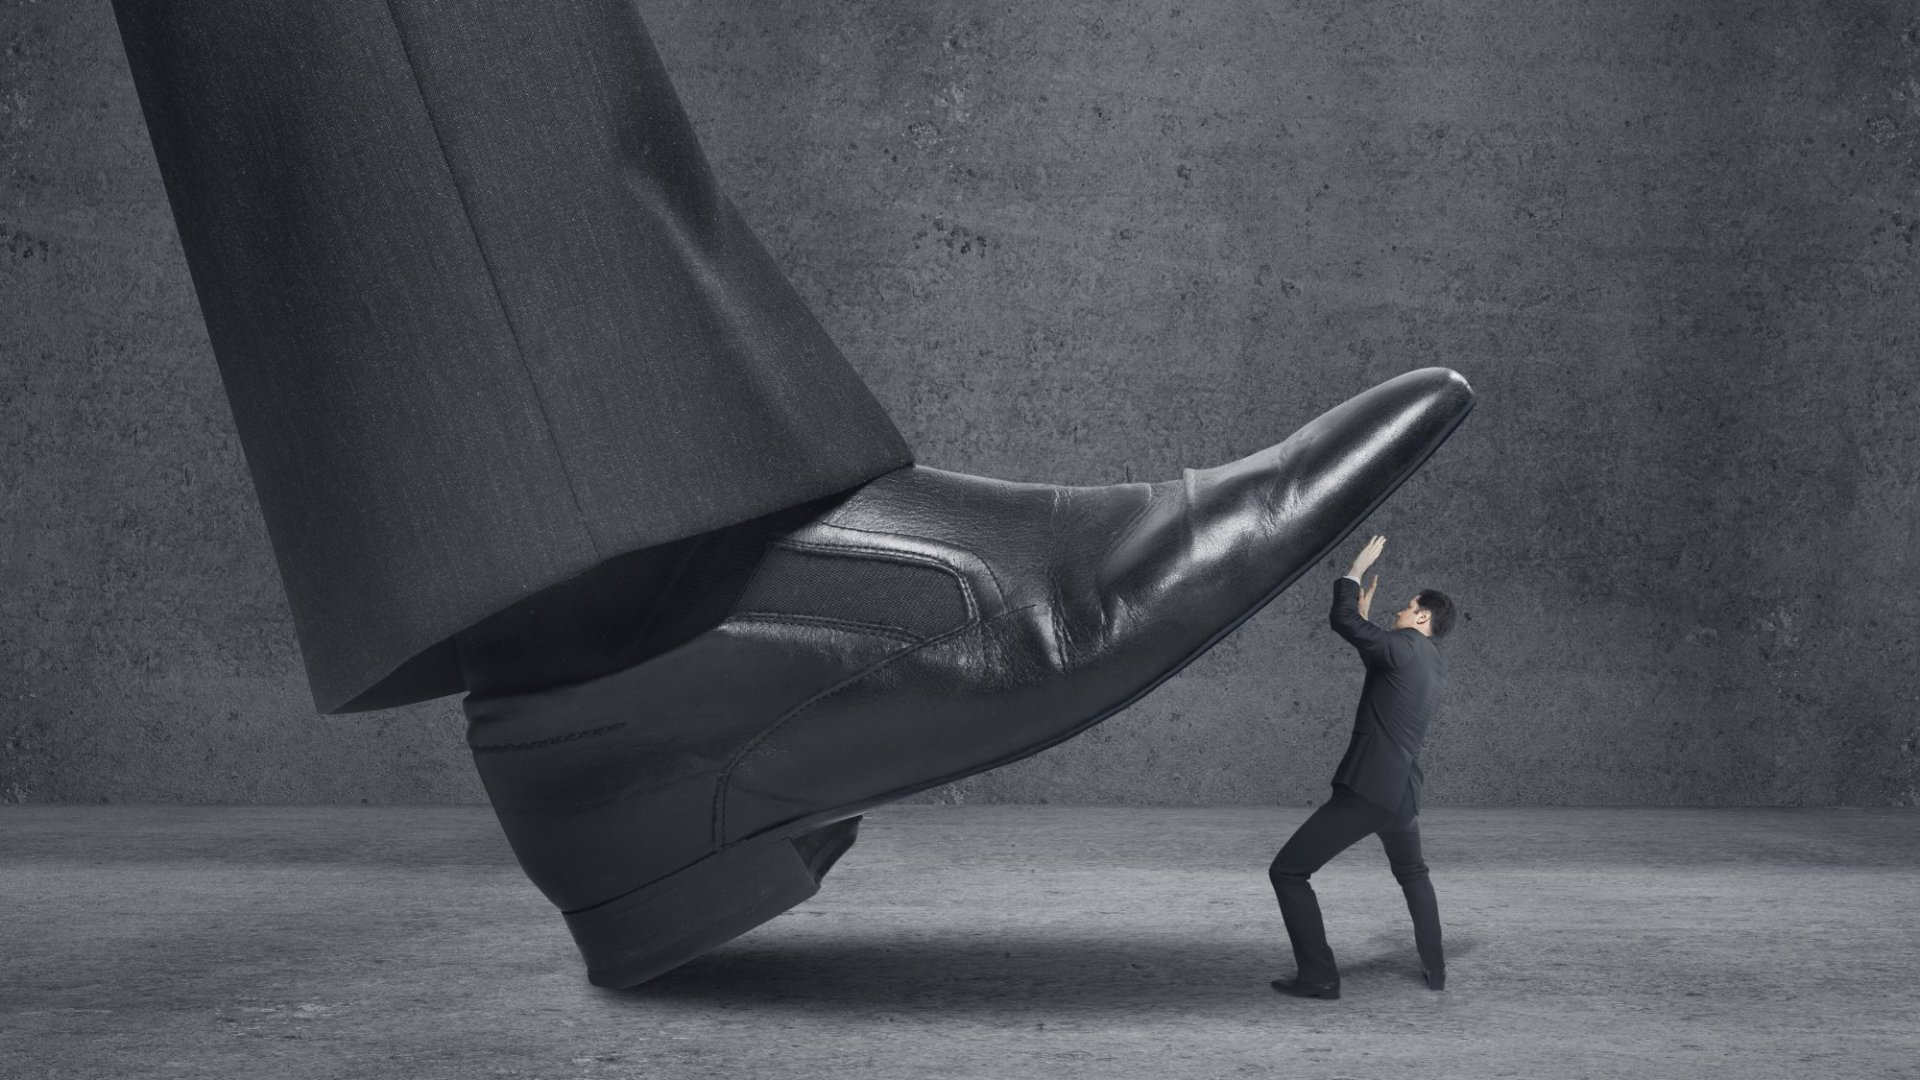 5 Tips to Overcome Chronic Self-Doubt